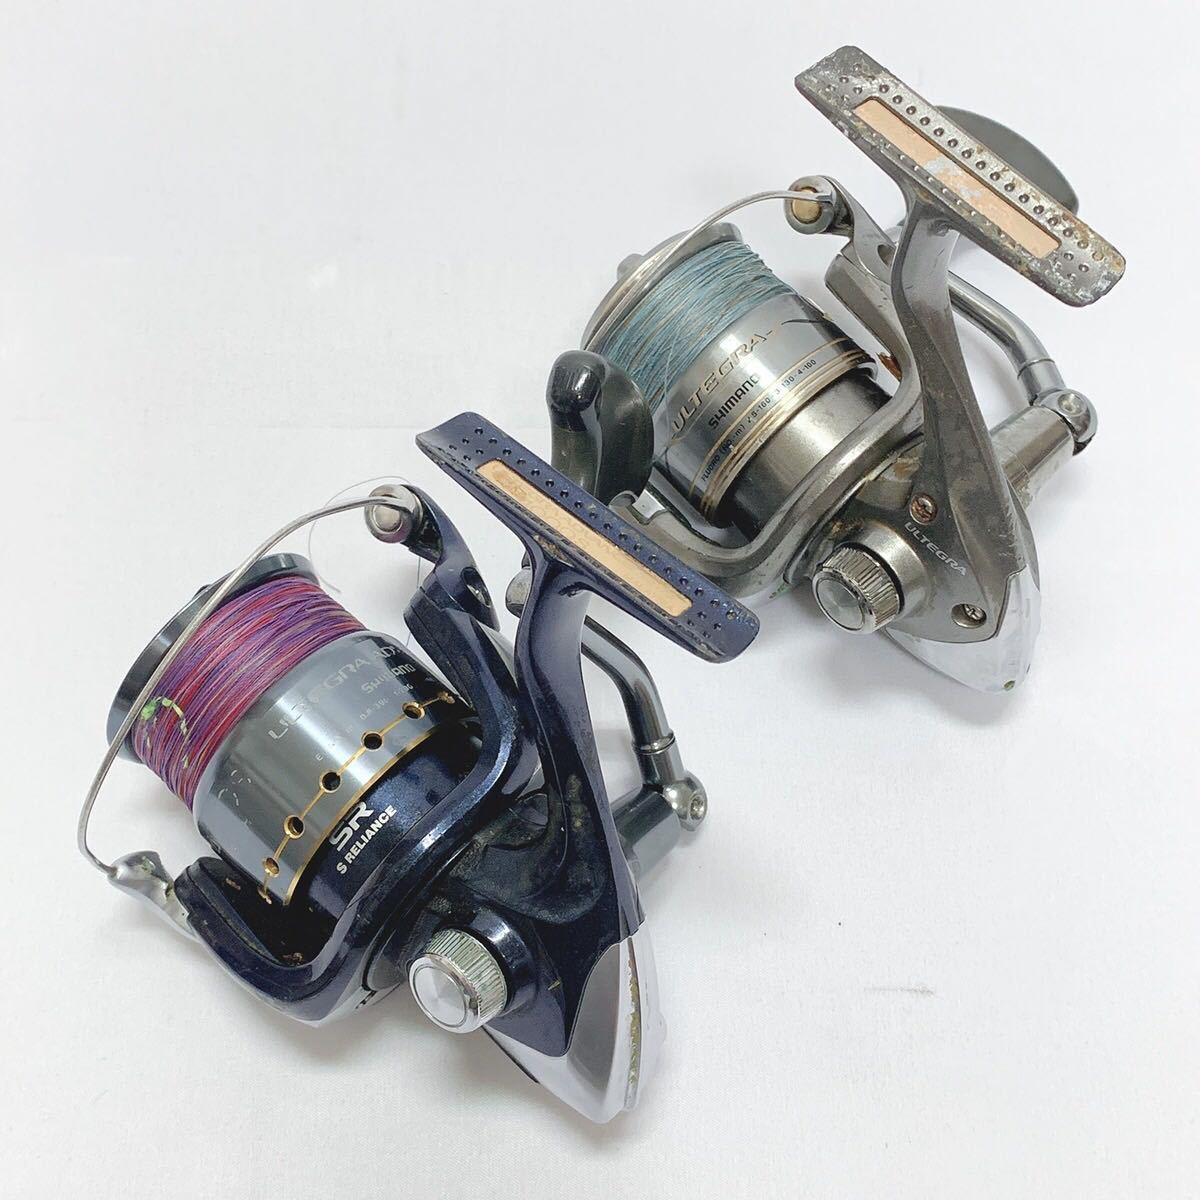 SHIMANO シマノ アルテグラ 4000S/SHIMANO シマノ アルテグラ C3000/リール 2点セット 釣り具 R尼0407